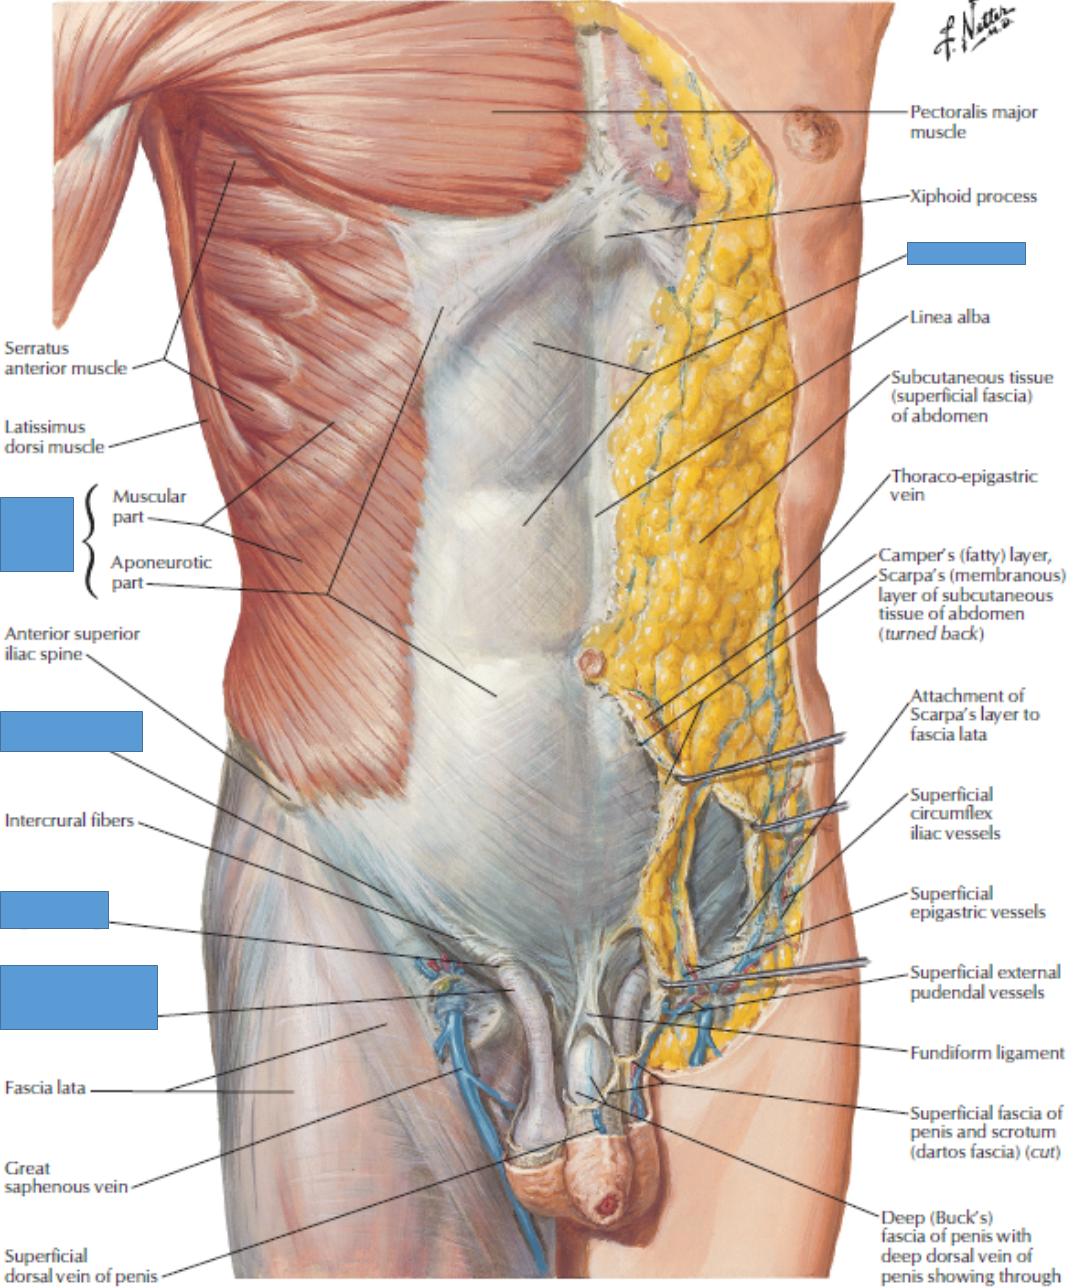 Lecture 1 Abdomen (Gross Anatomy Unit 7) Flashcards | Memorang